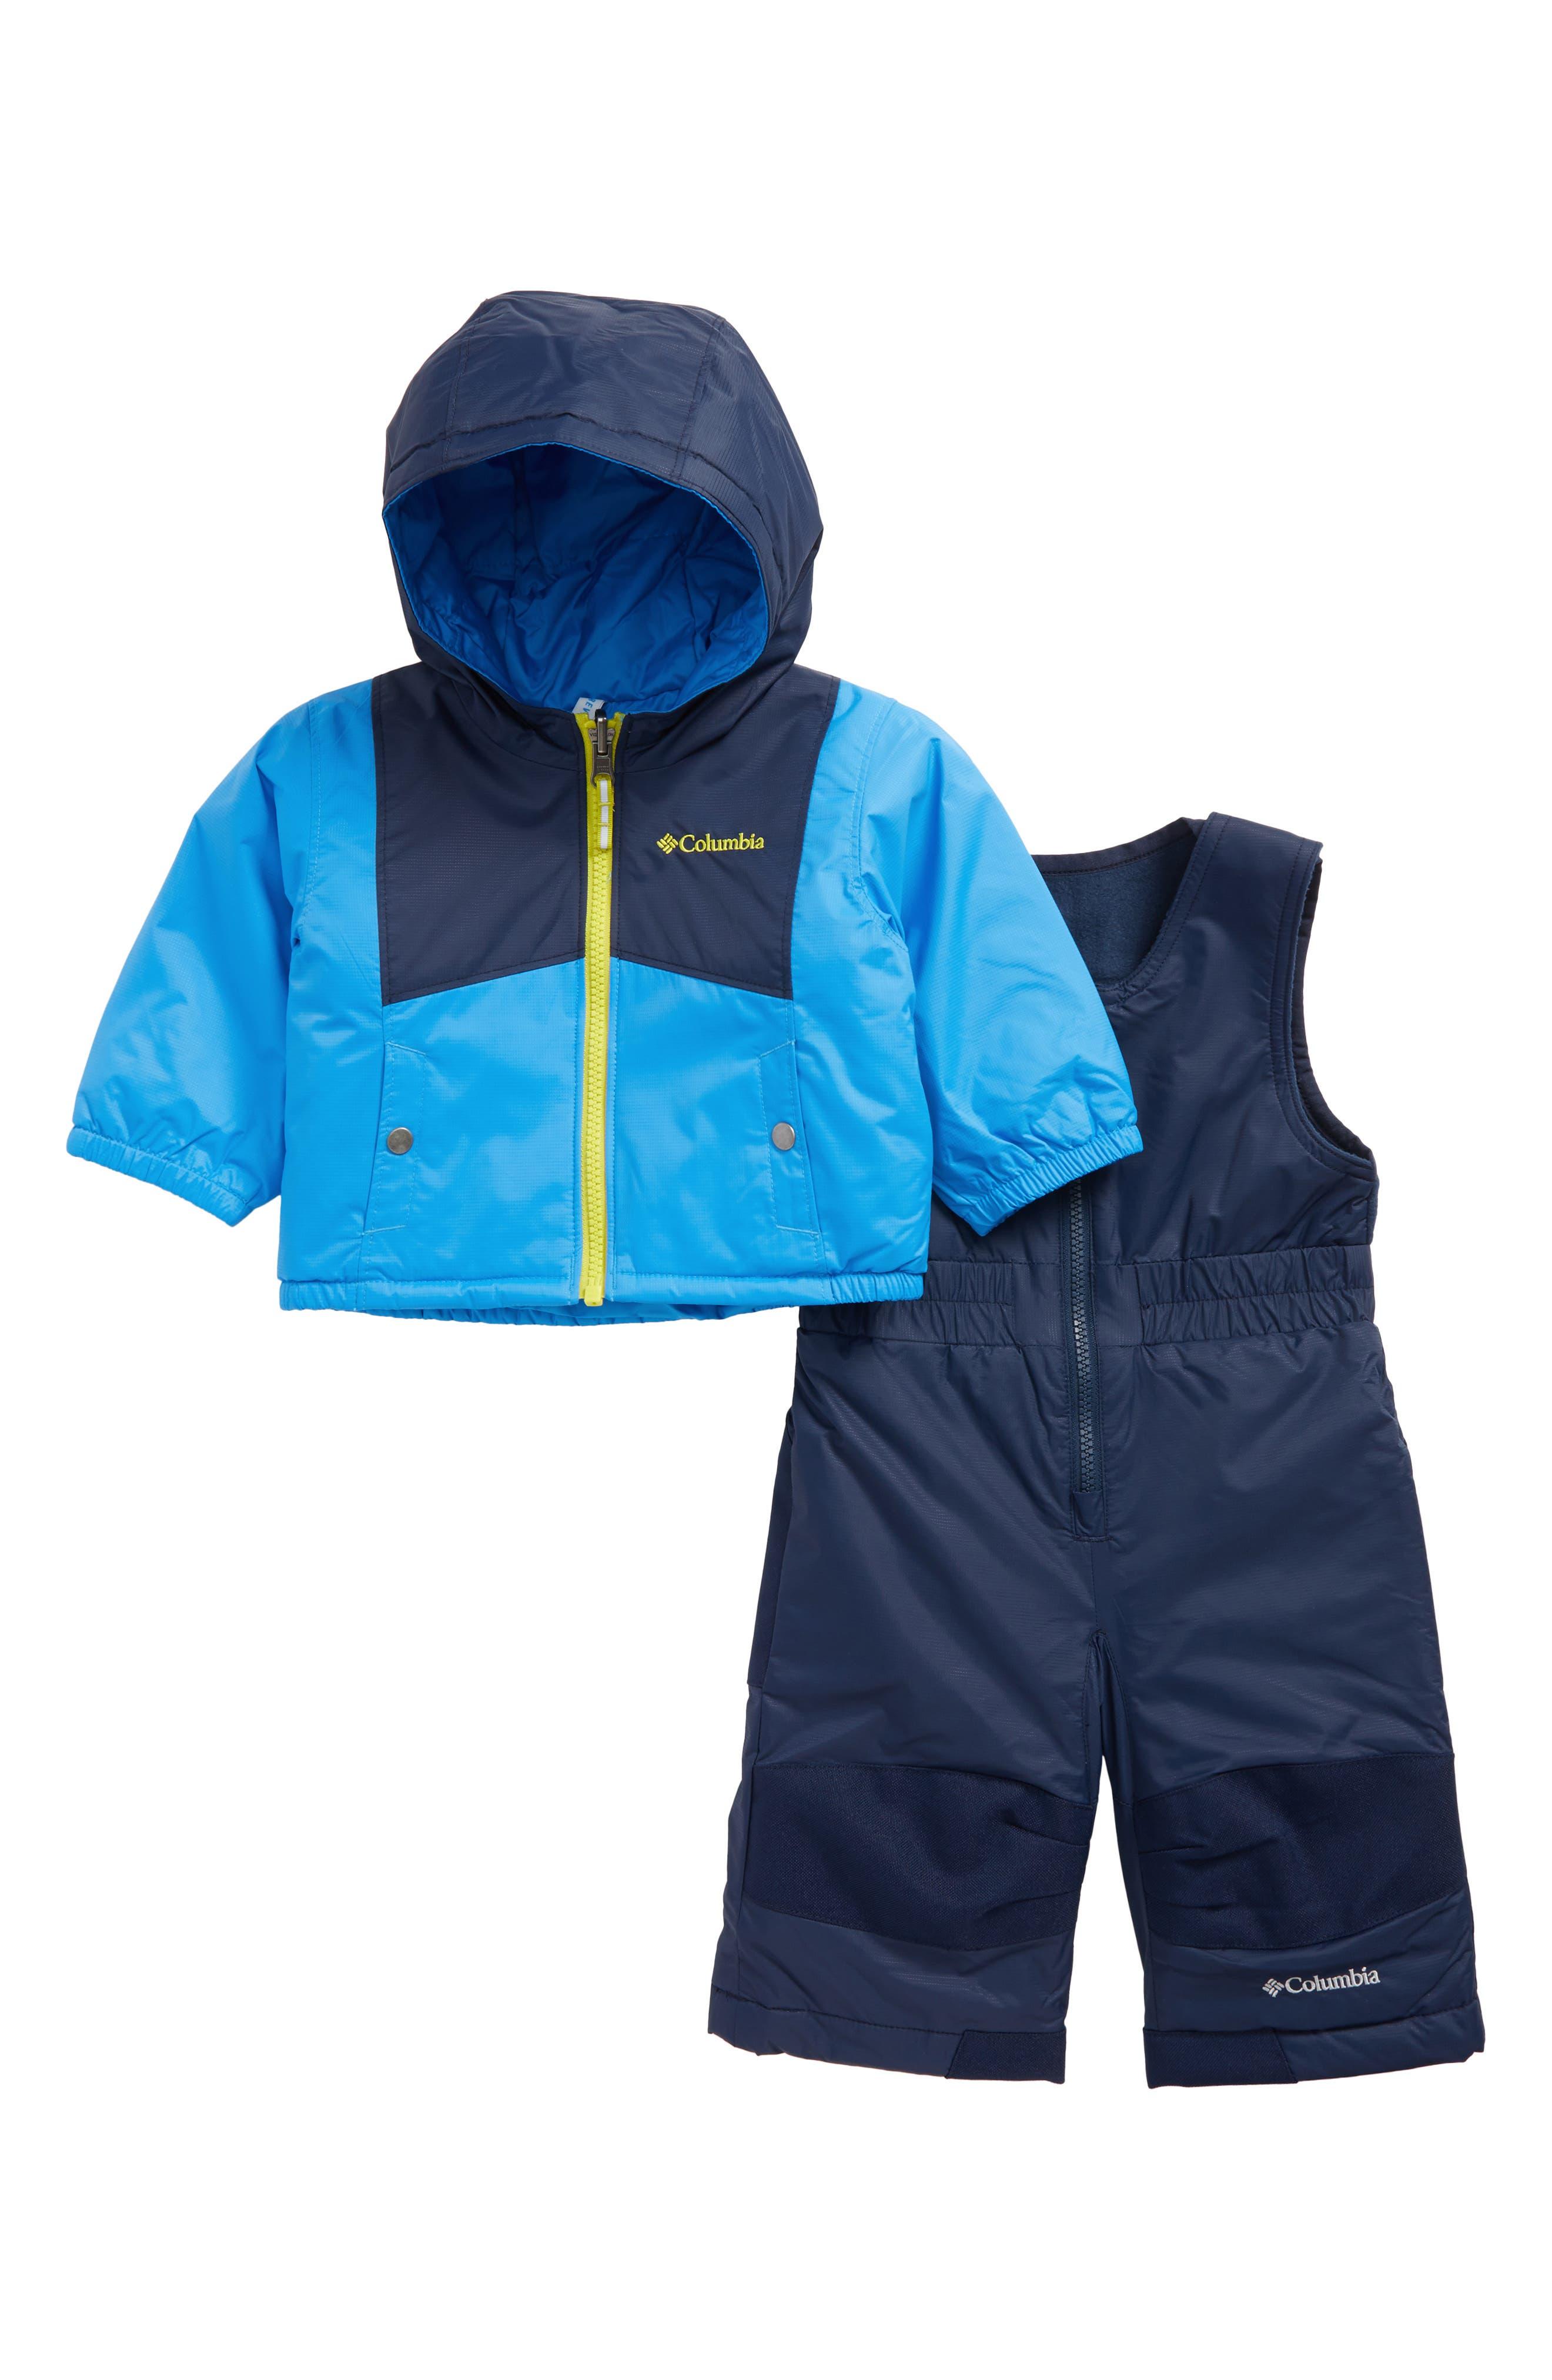 Columbia Double Flake Waterproof Insulated Jacket & Bib Snowsuit (Baby Boys)